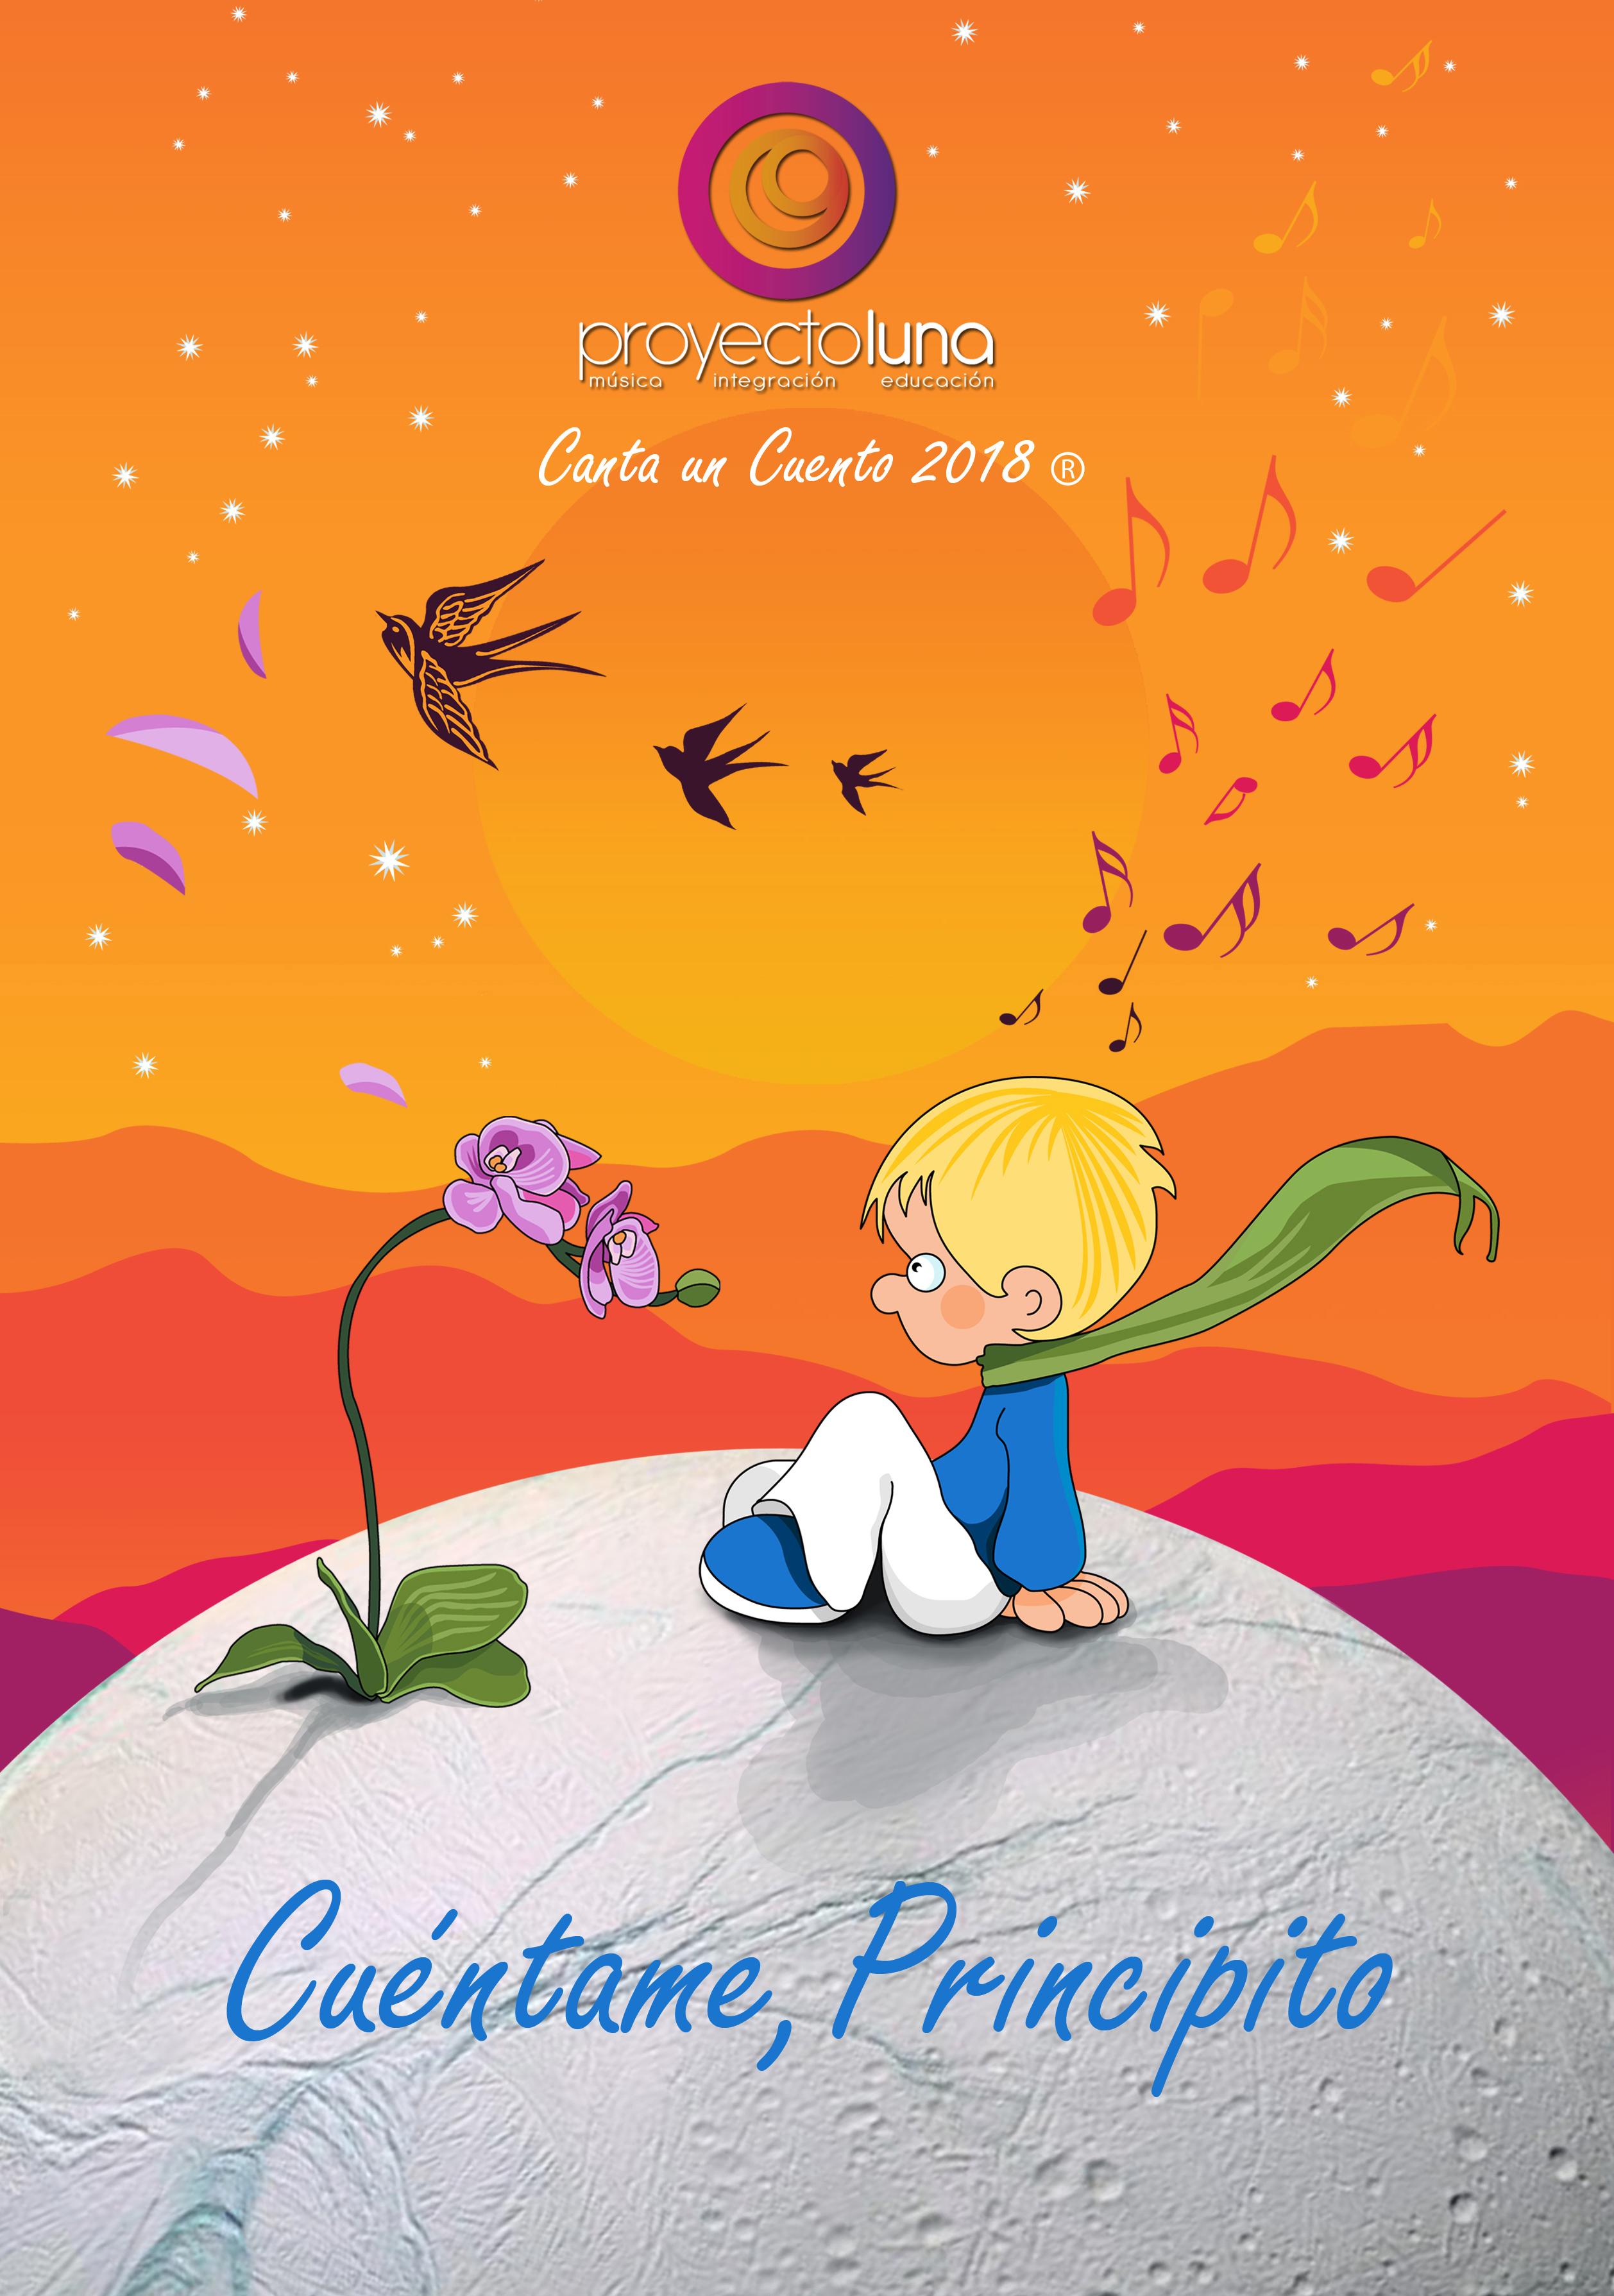 ProyectoLuna_DossierA4_2018_Delantera_P1